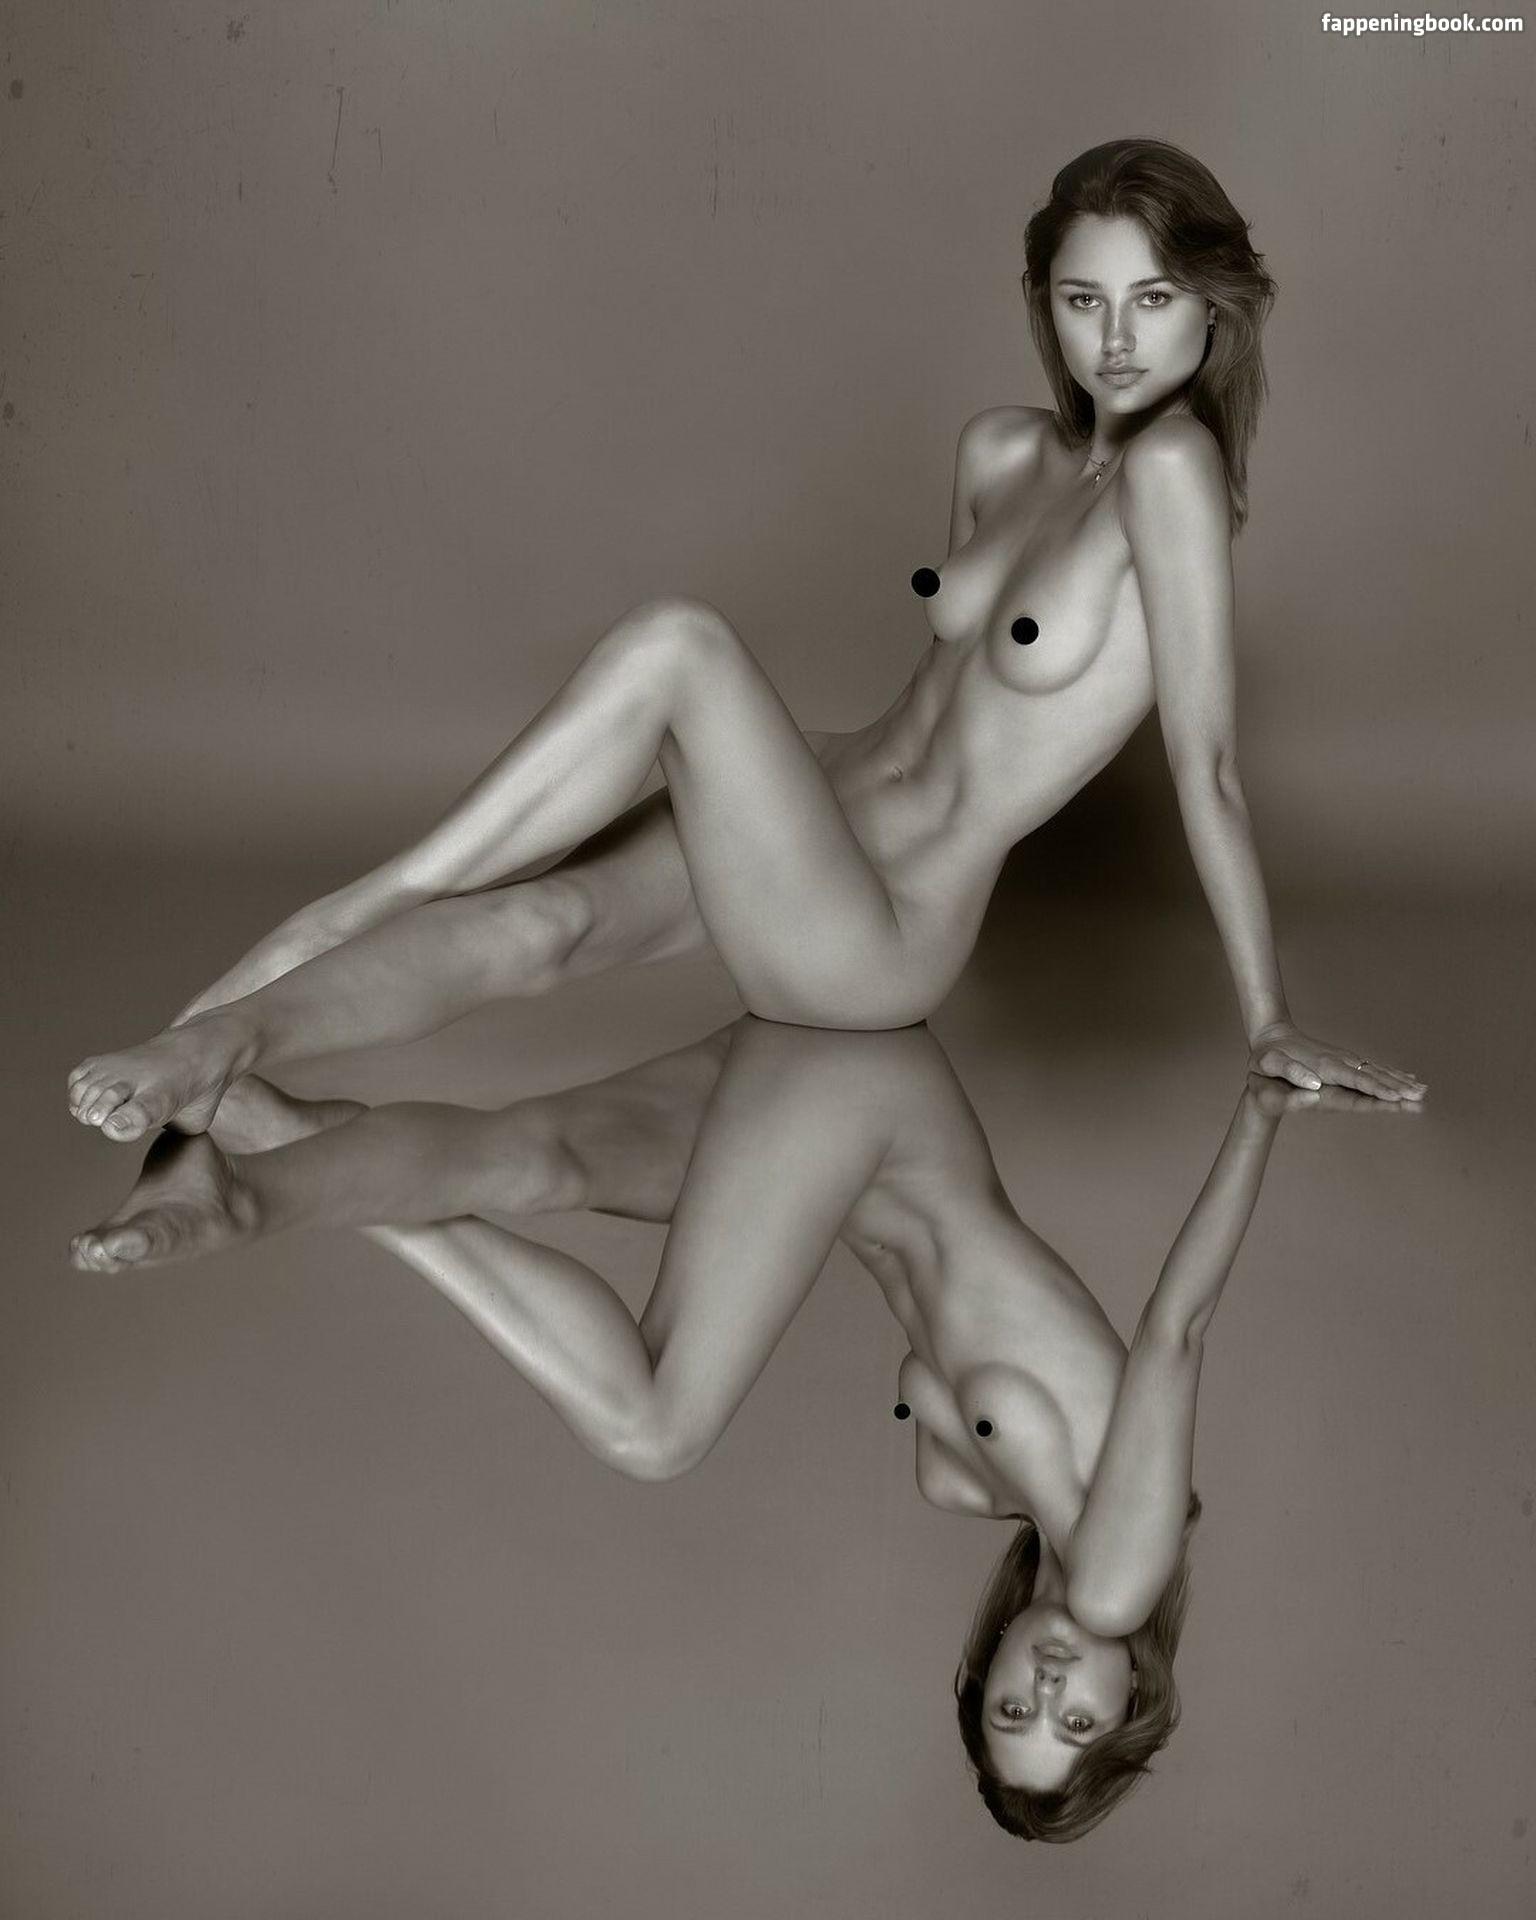 Hannah Palmer Sexy Hot Photos - Page 2 - FappeningBook  nackt